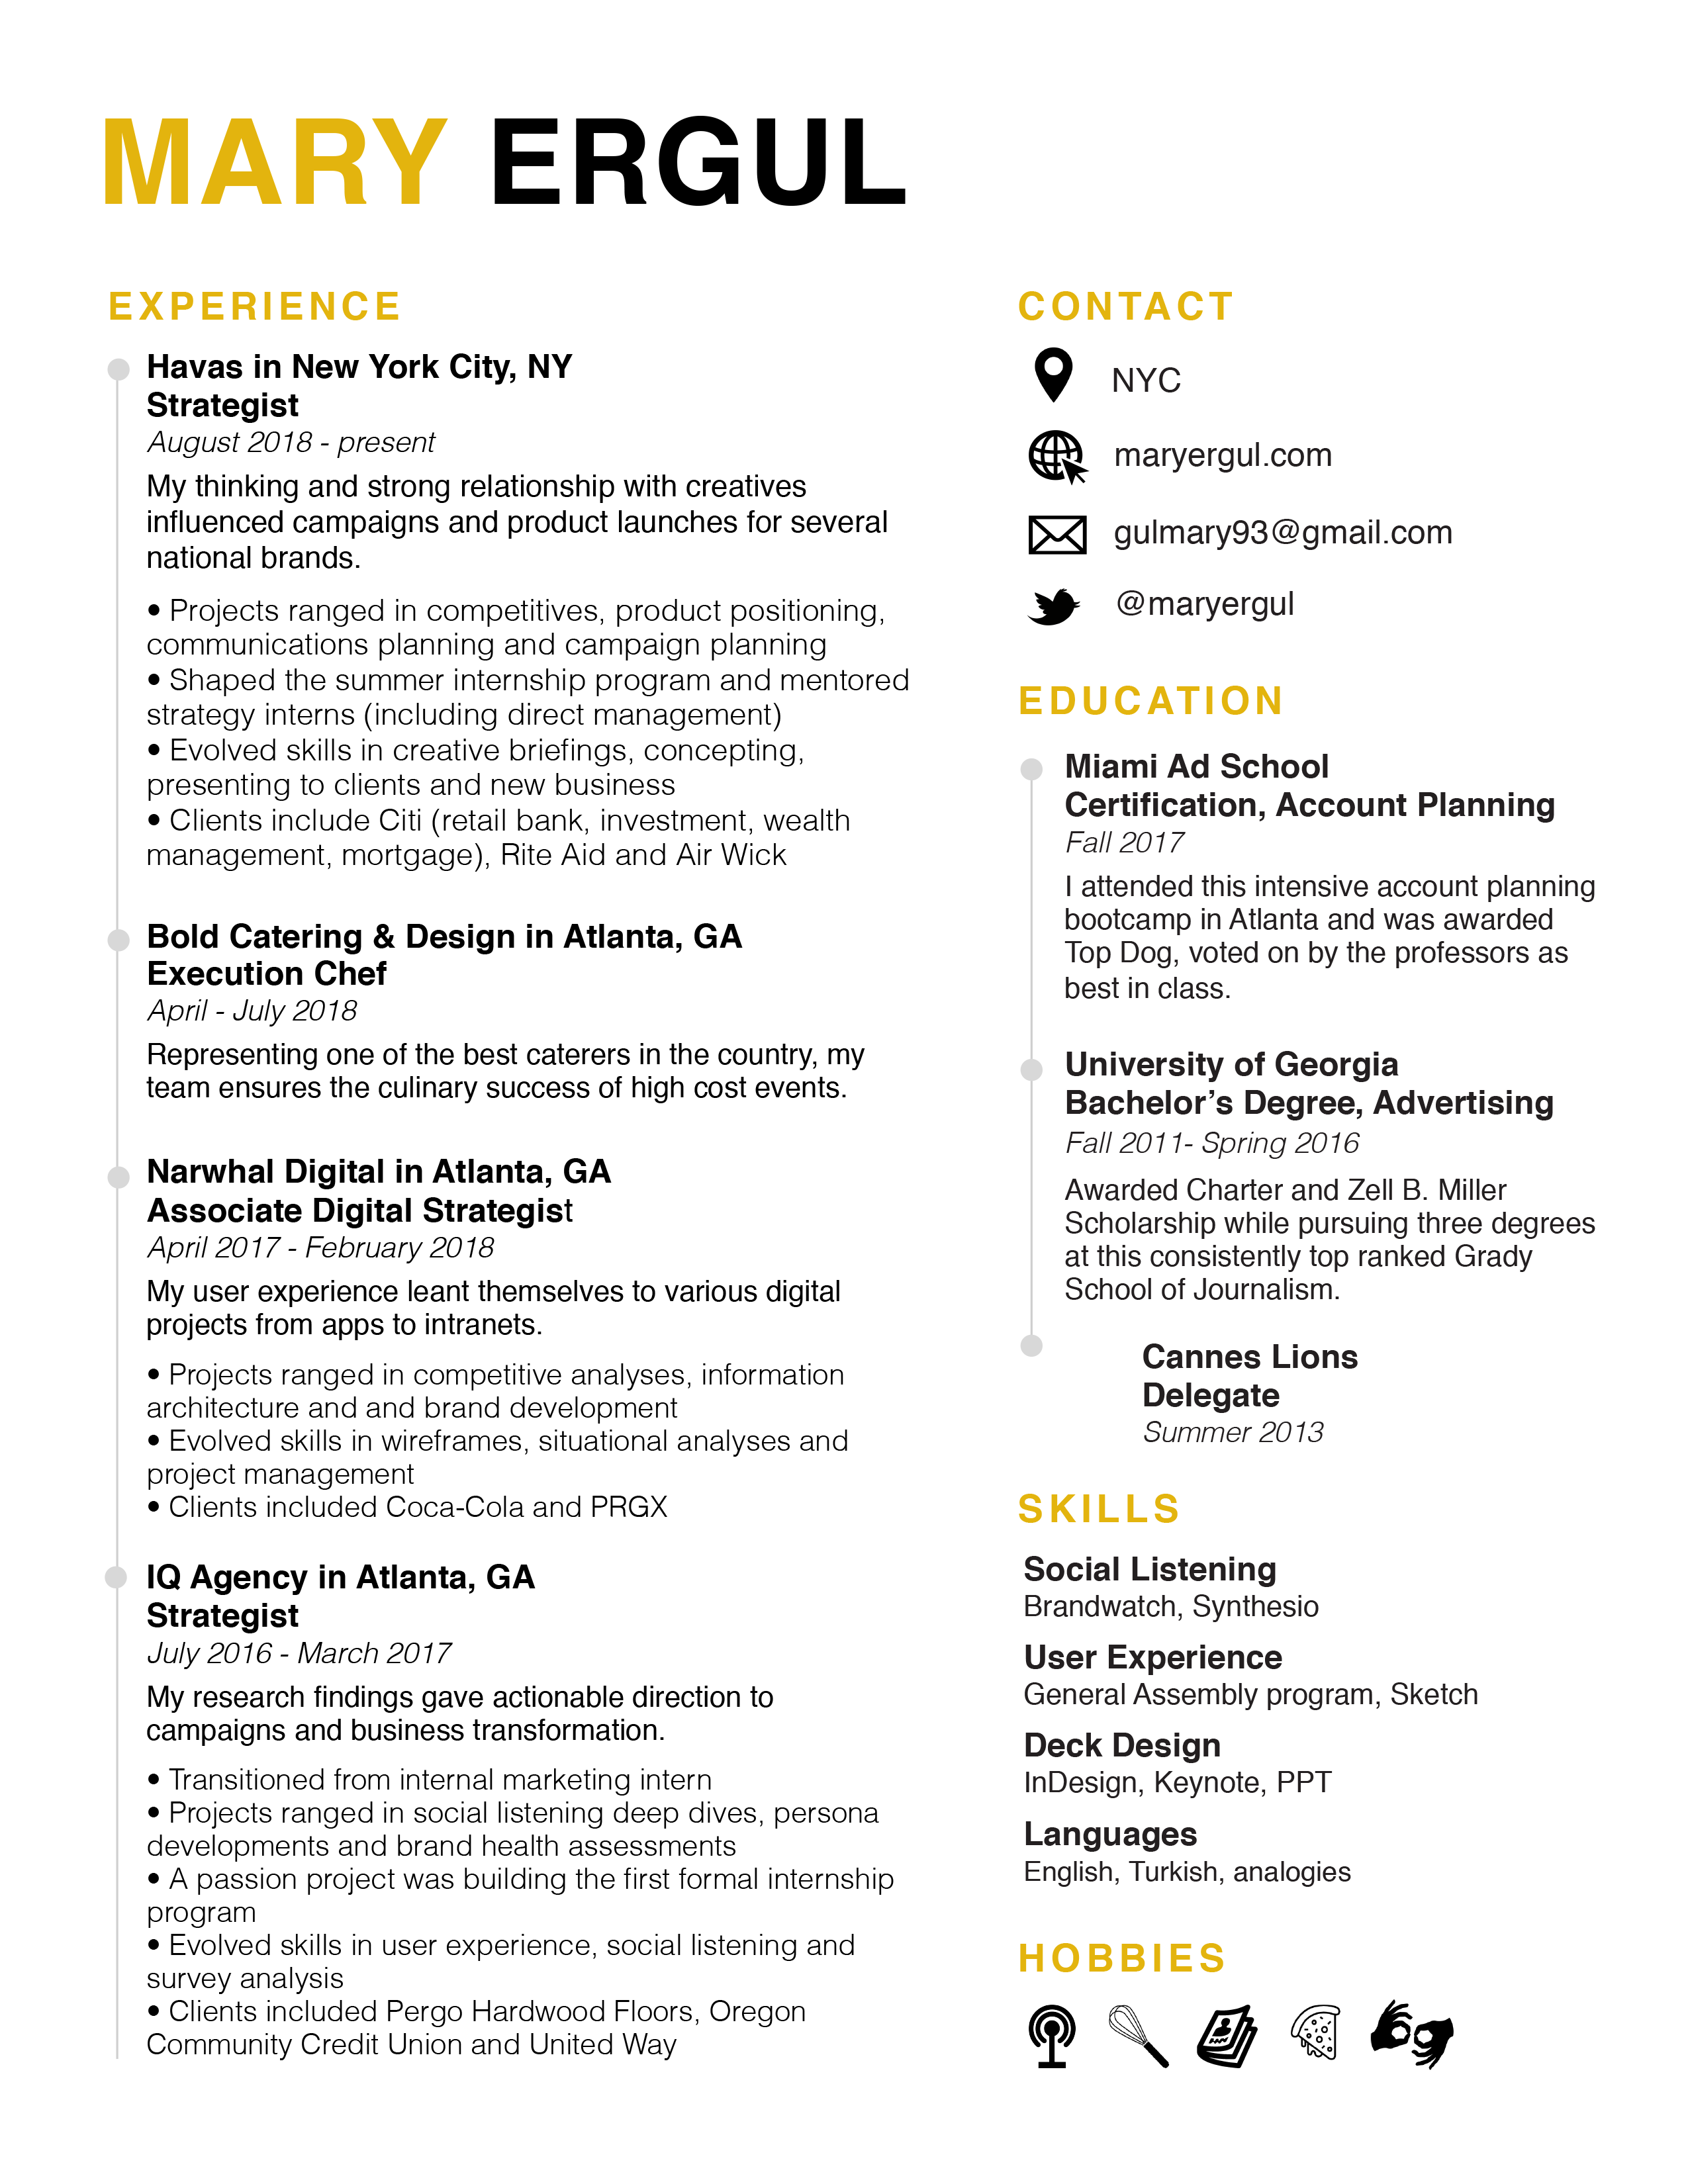 mary-ergul-2019-resume